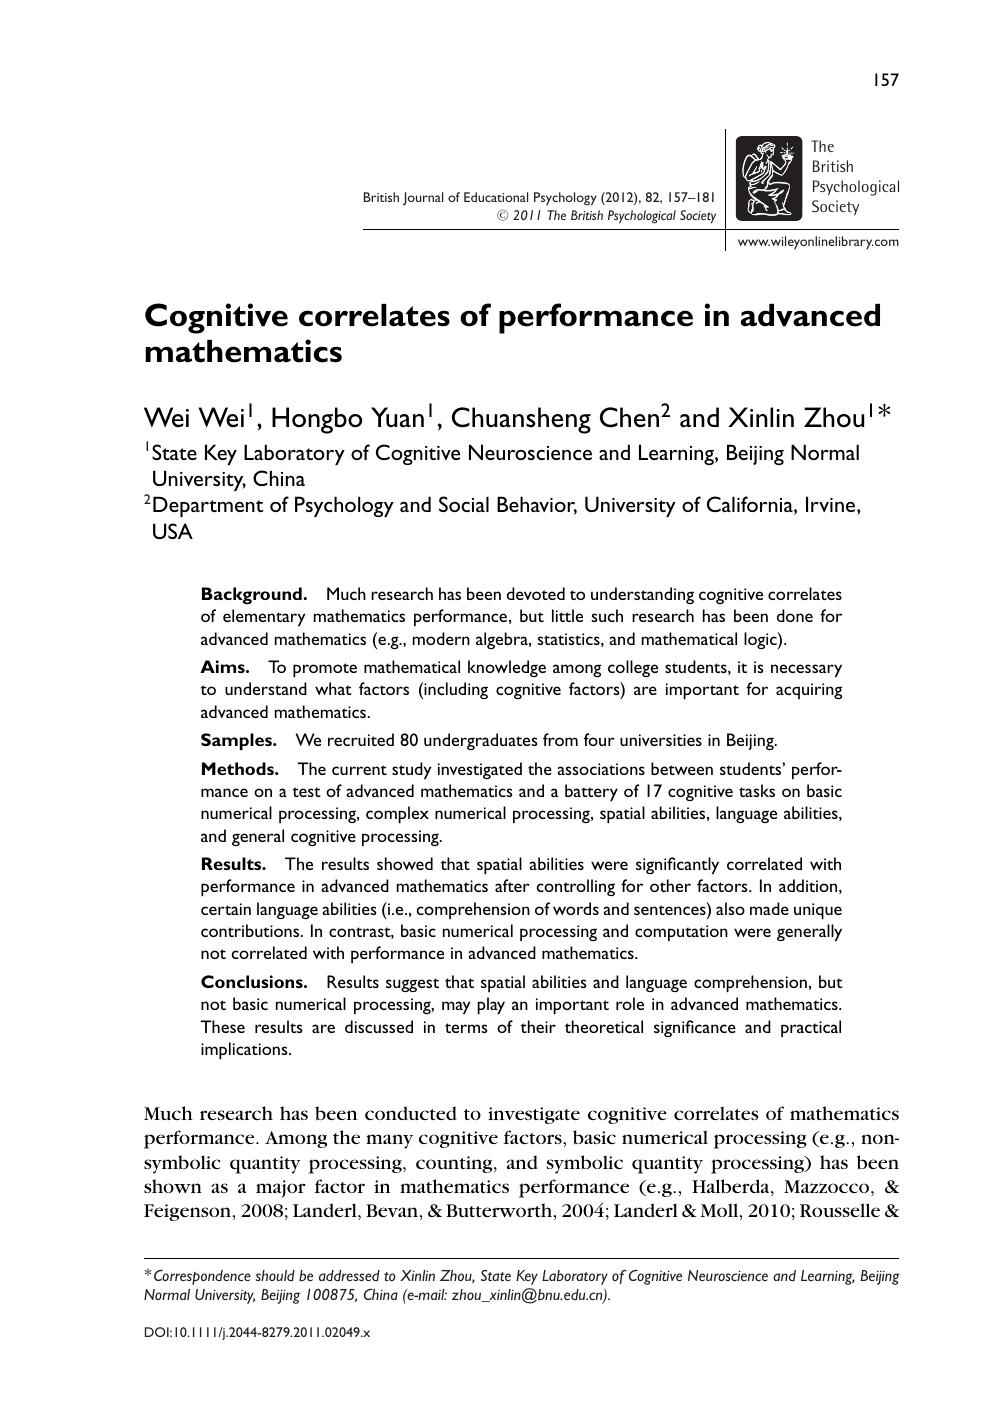 Cognitive correlates of performance in advanced mathematics